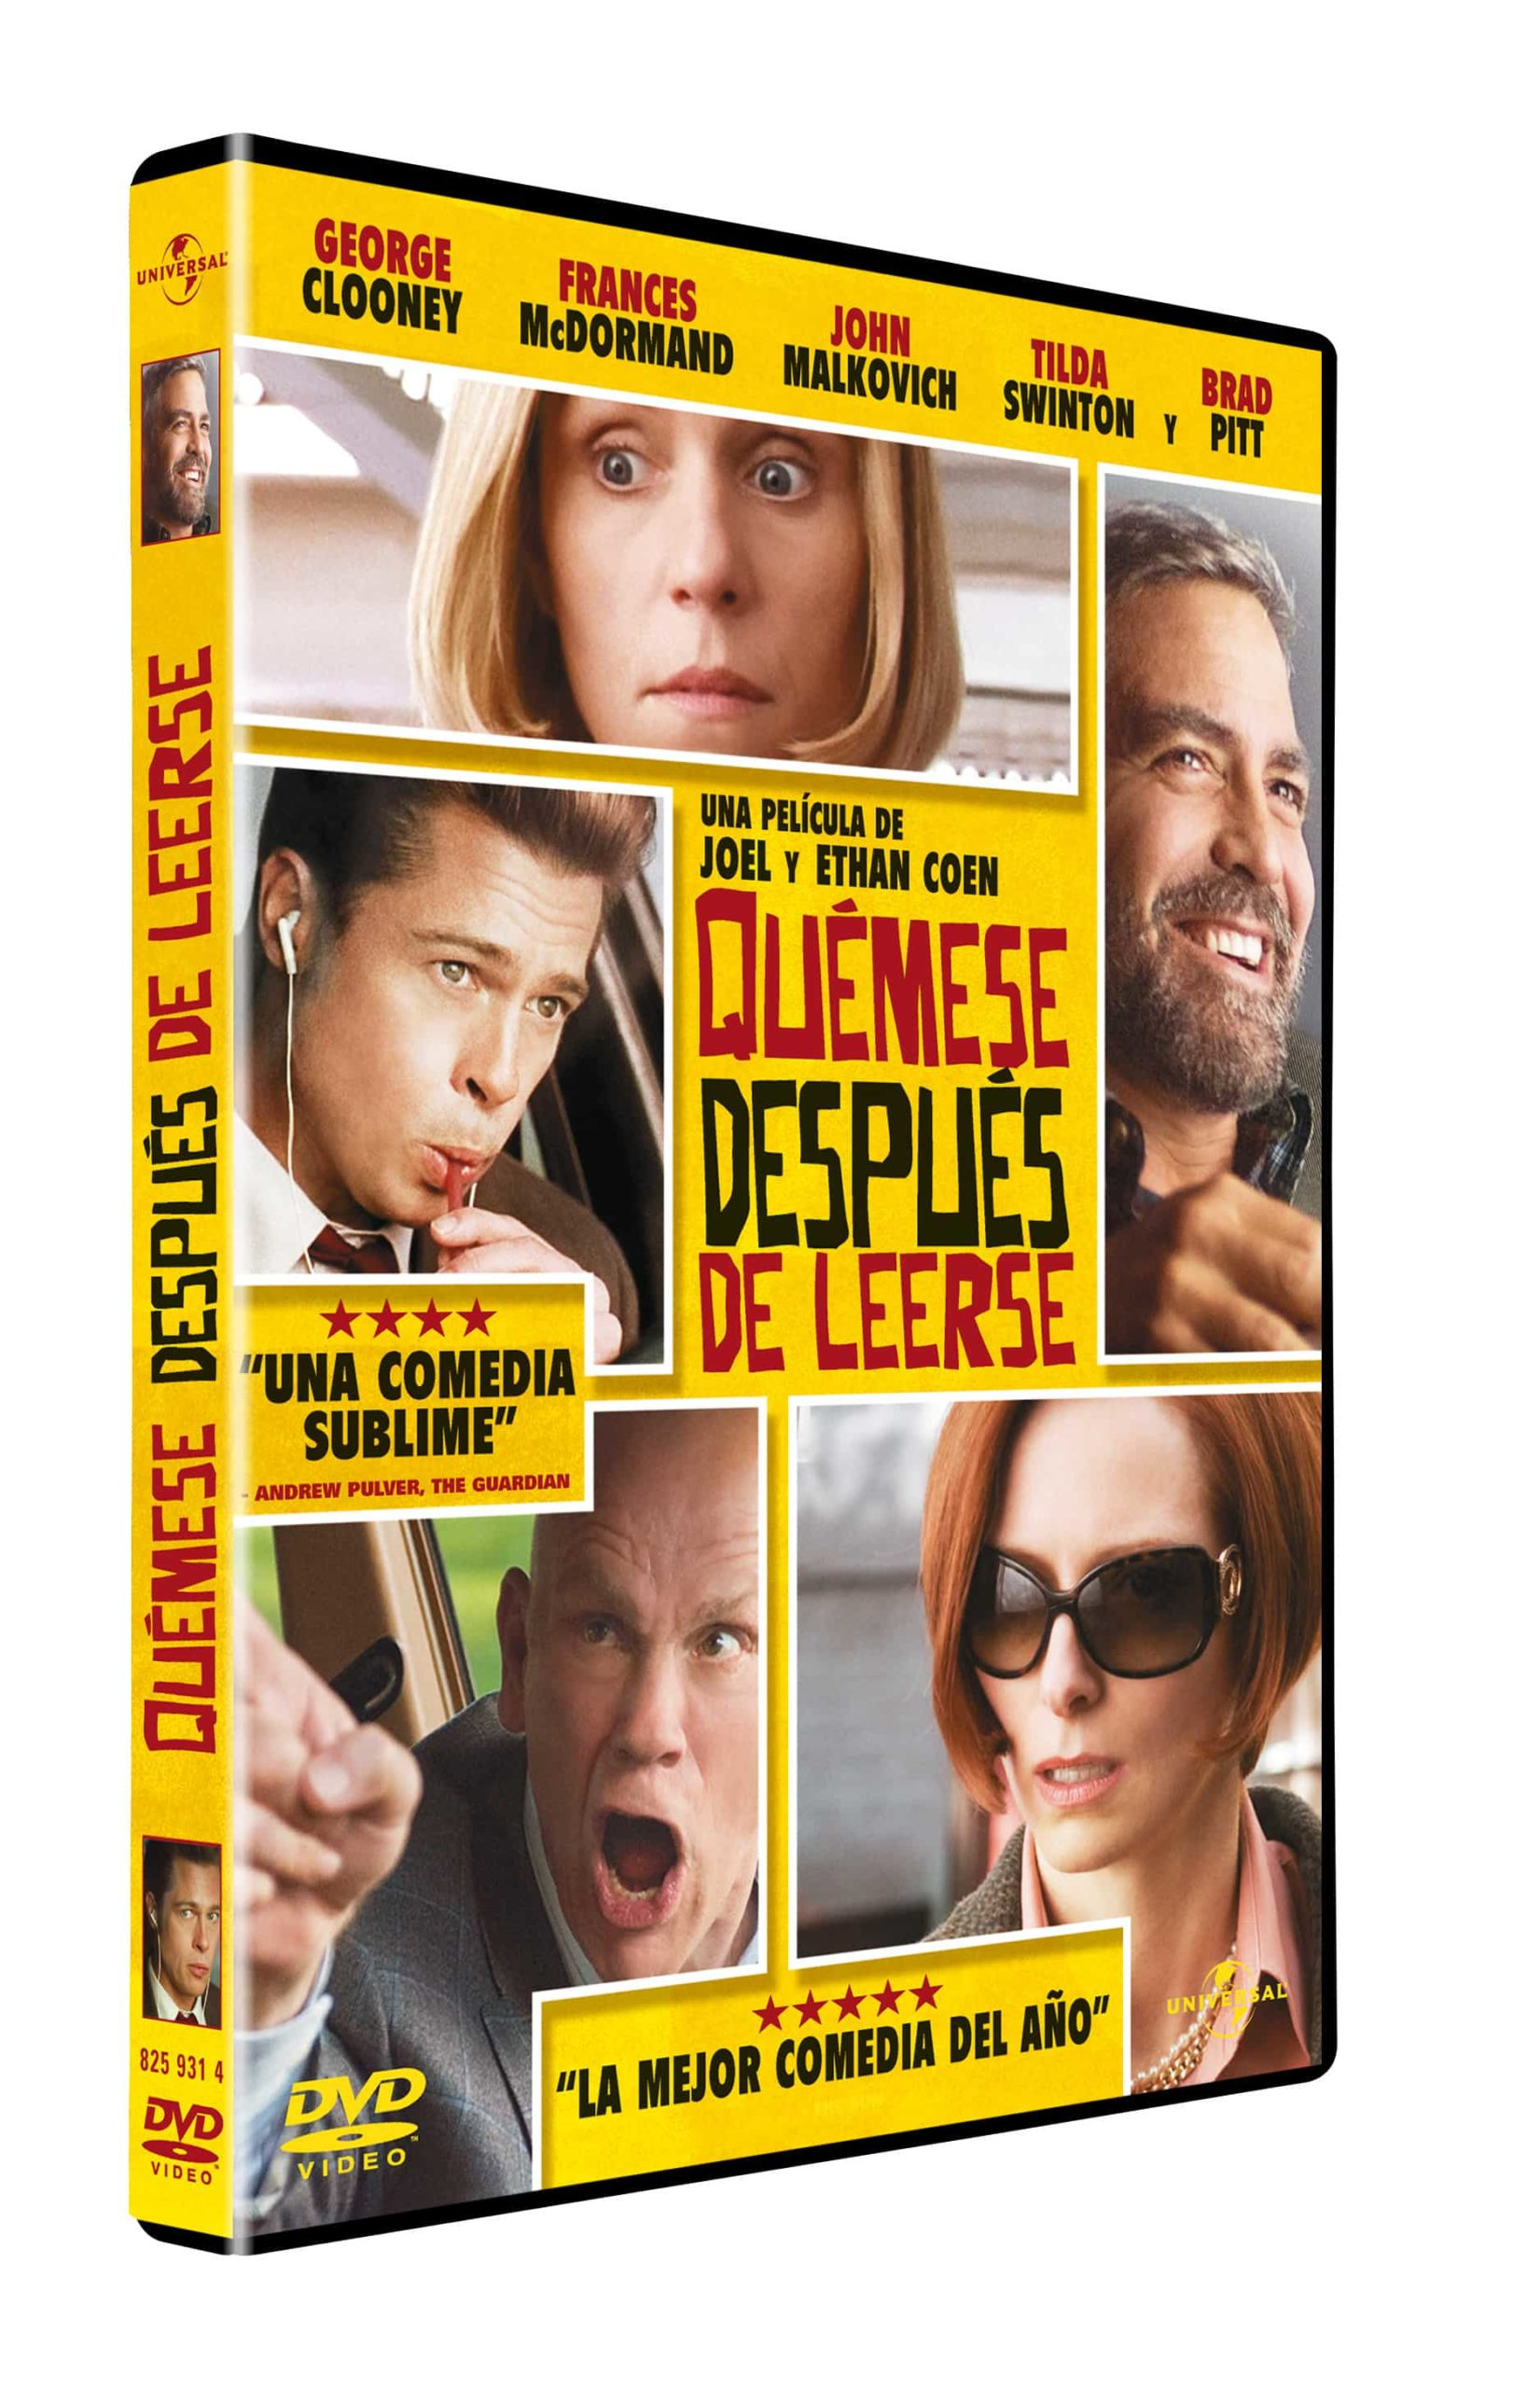 DVD de Quémese Después de Leerse